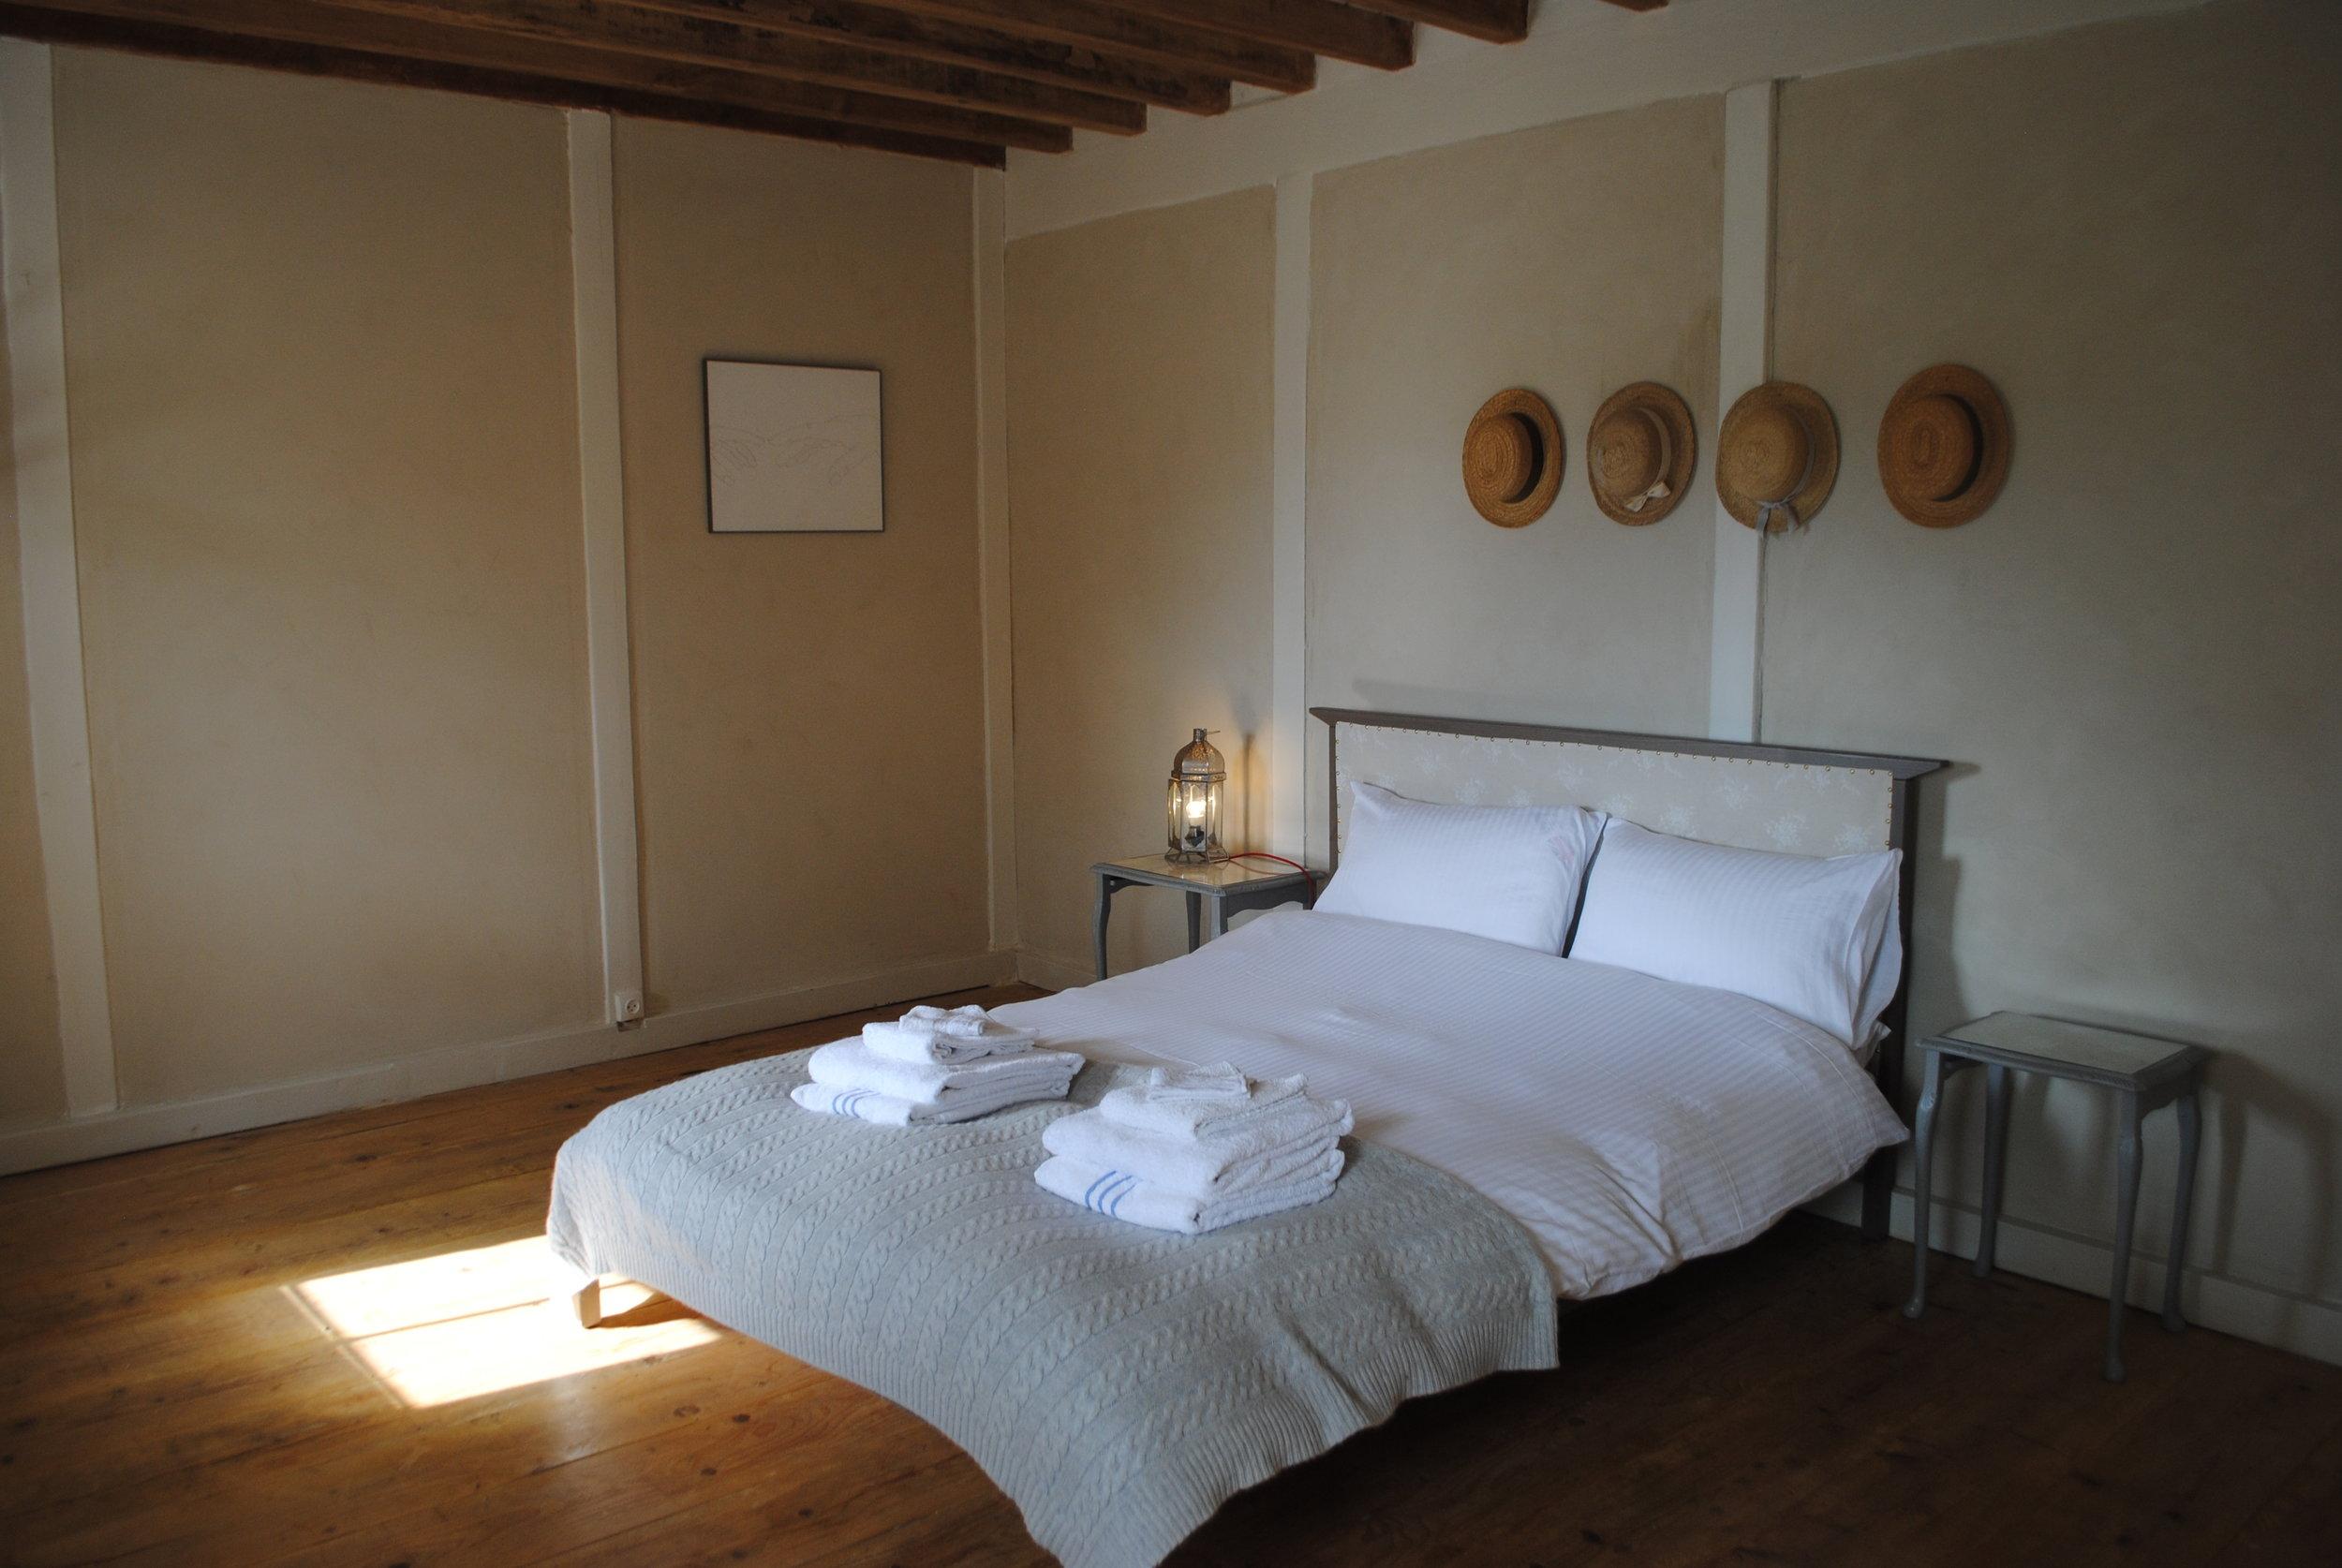 Rustic French interiors at La Jugie